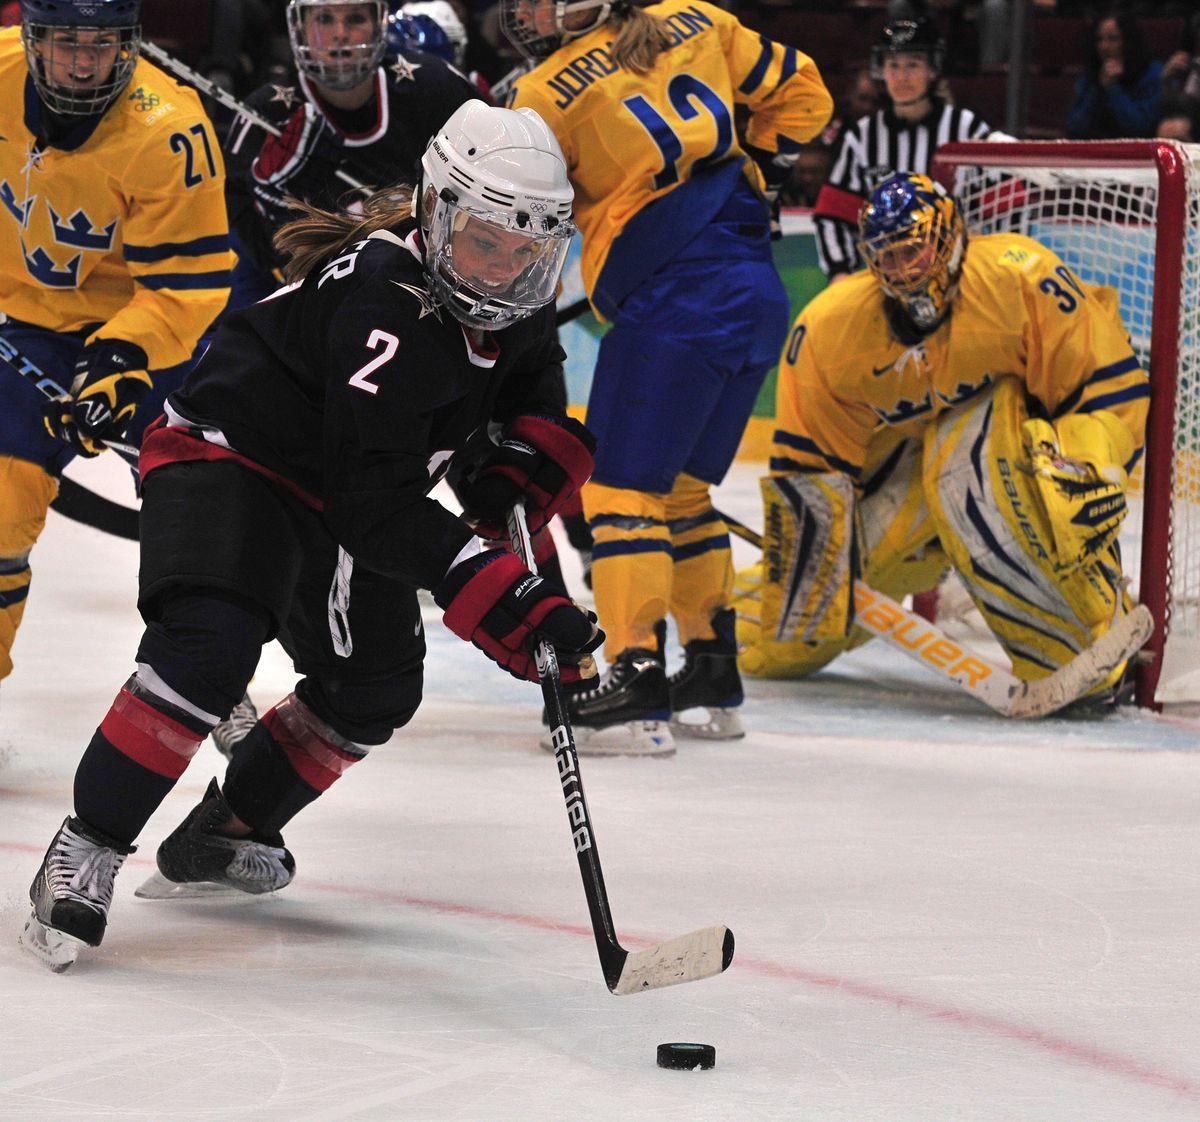 USA's forward Erika Lawler (2) skates wi